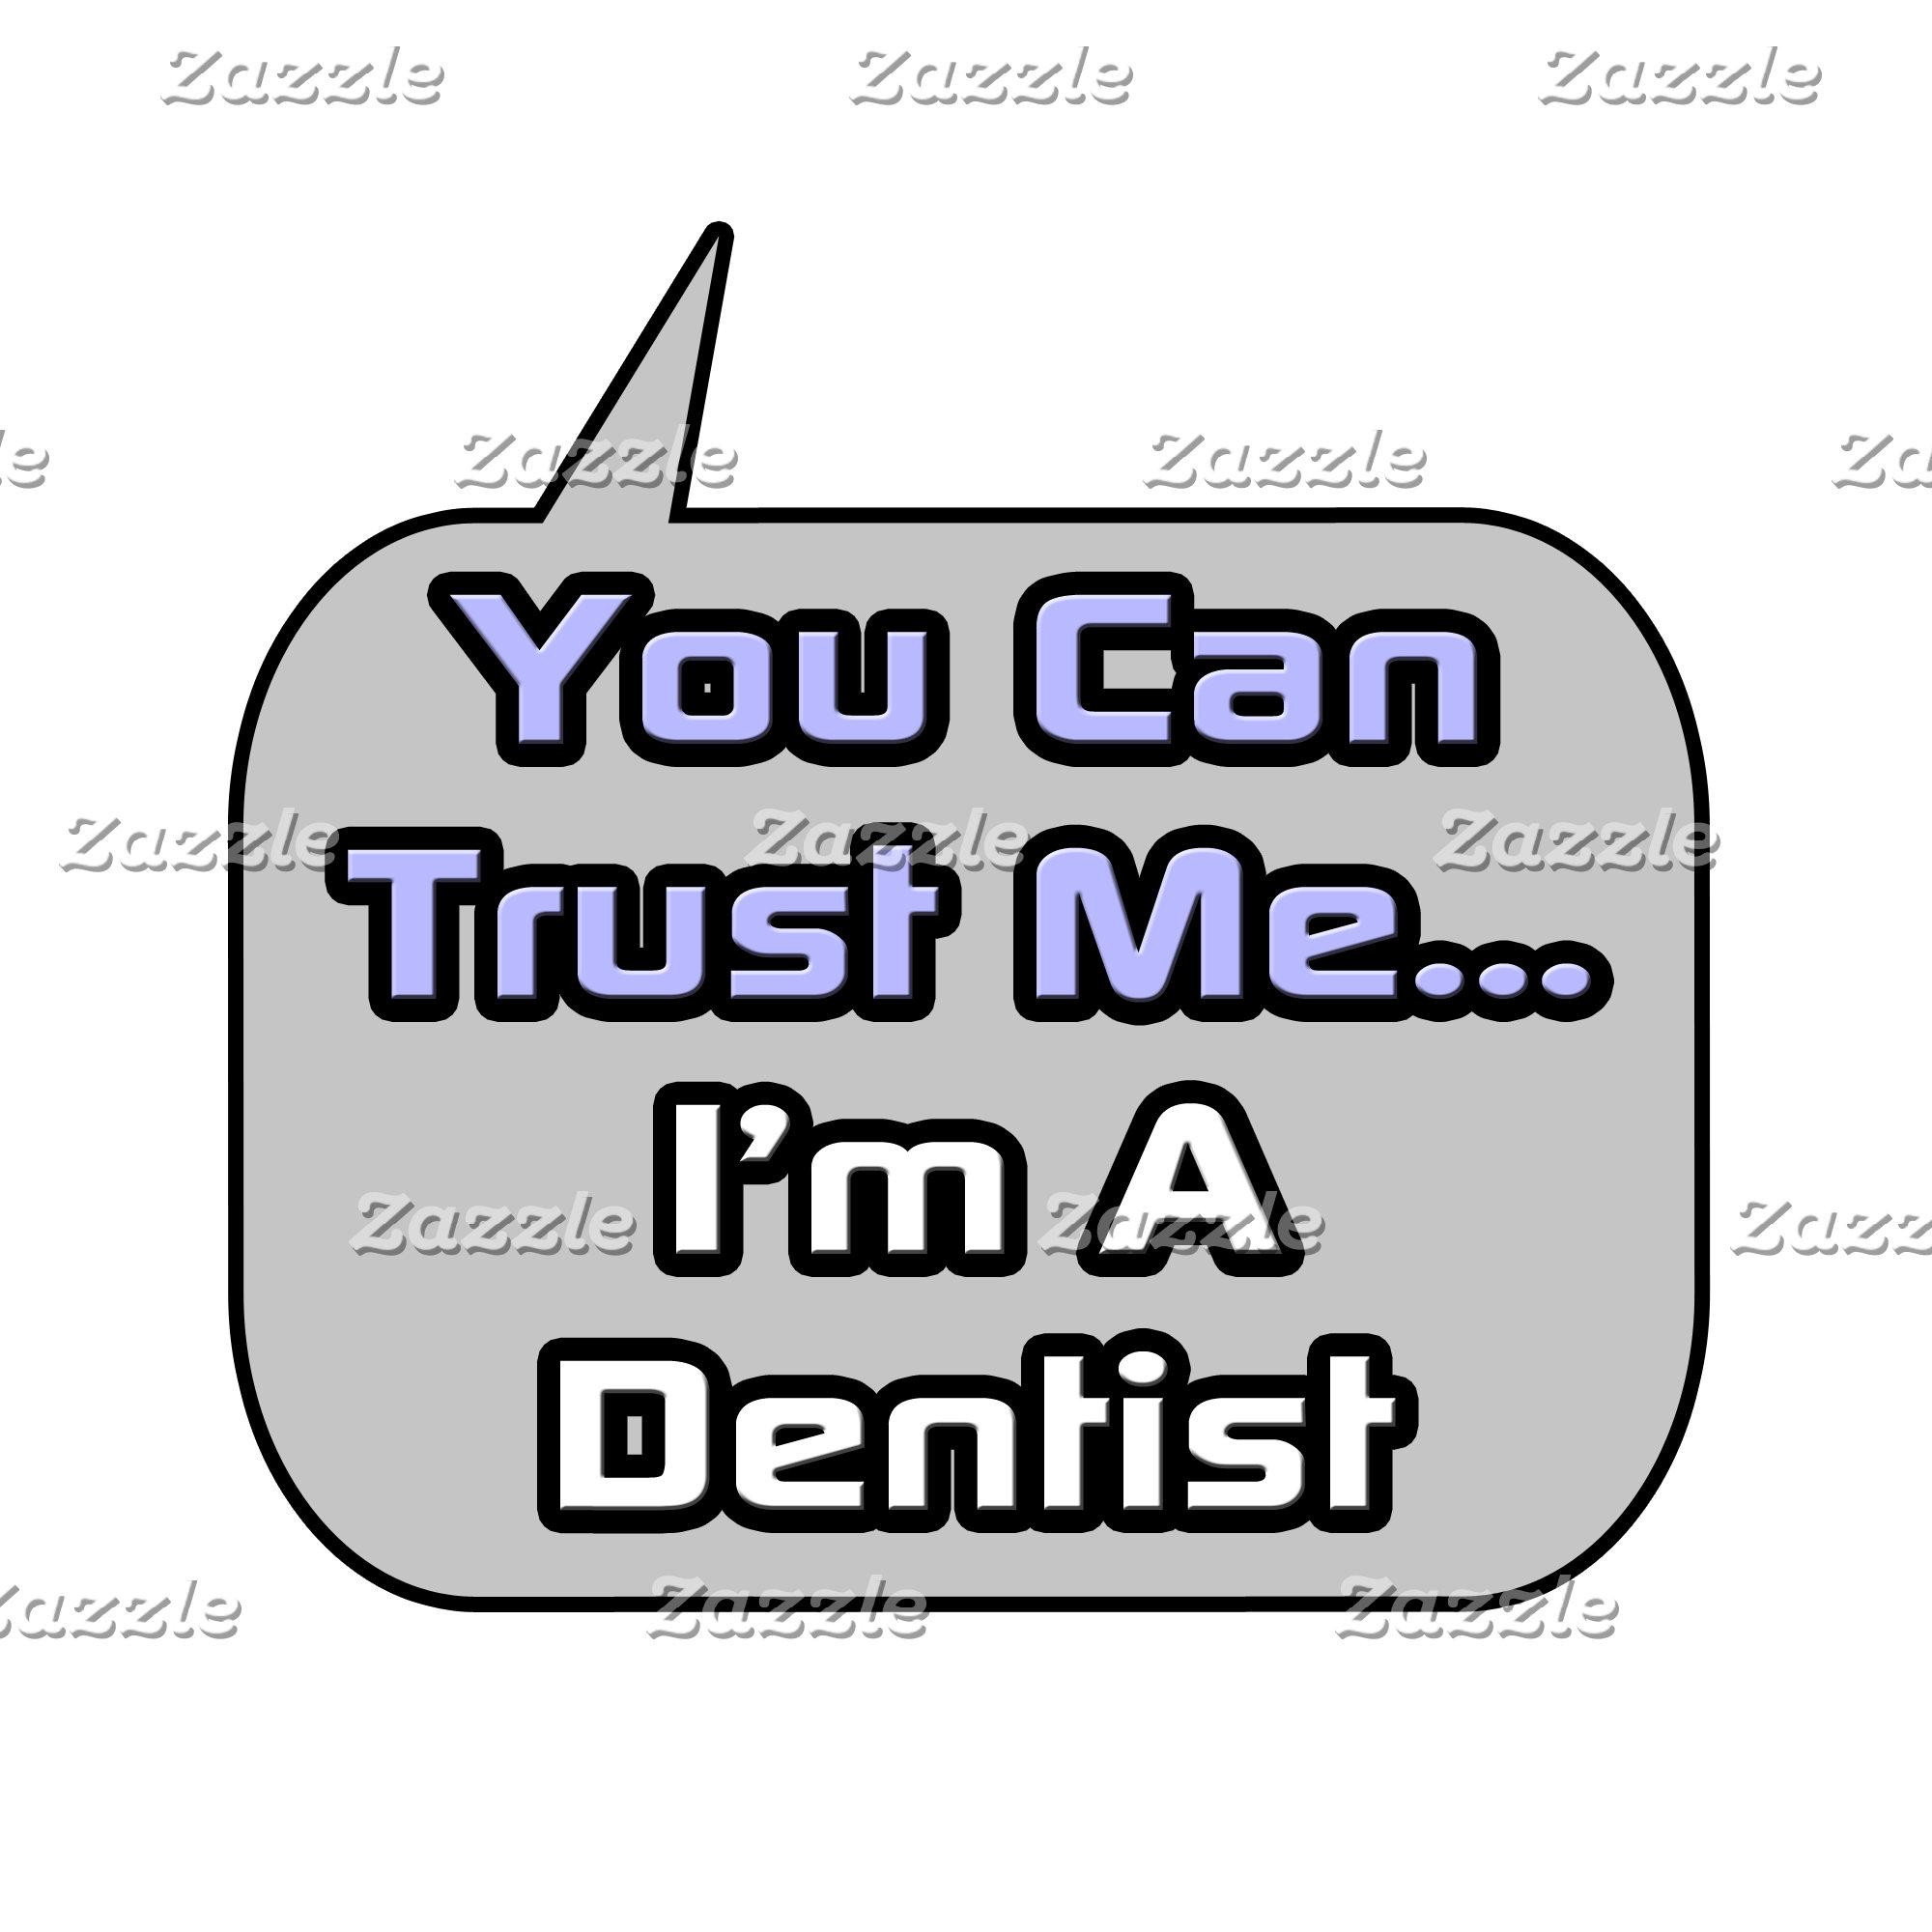 Trust Me .. I'm a Dentist